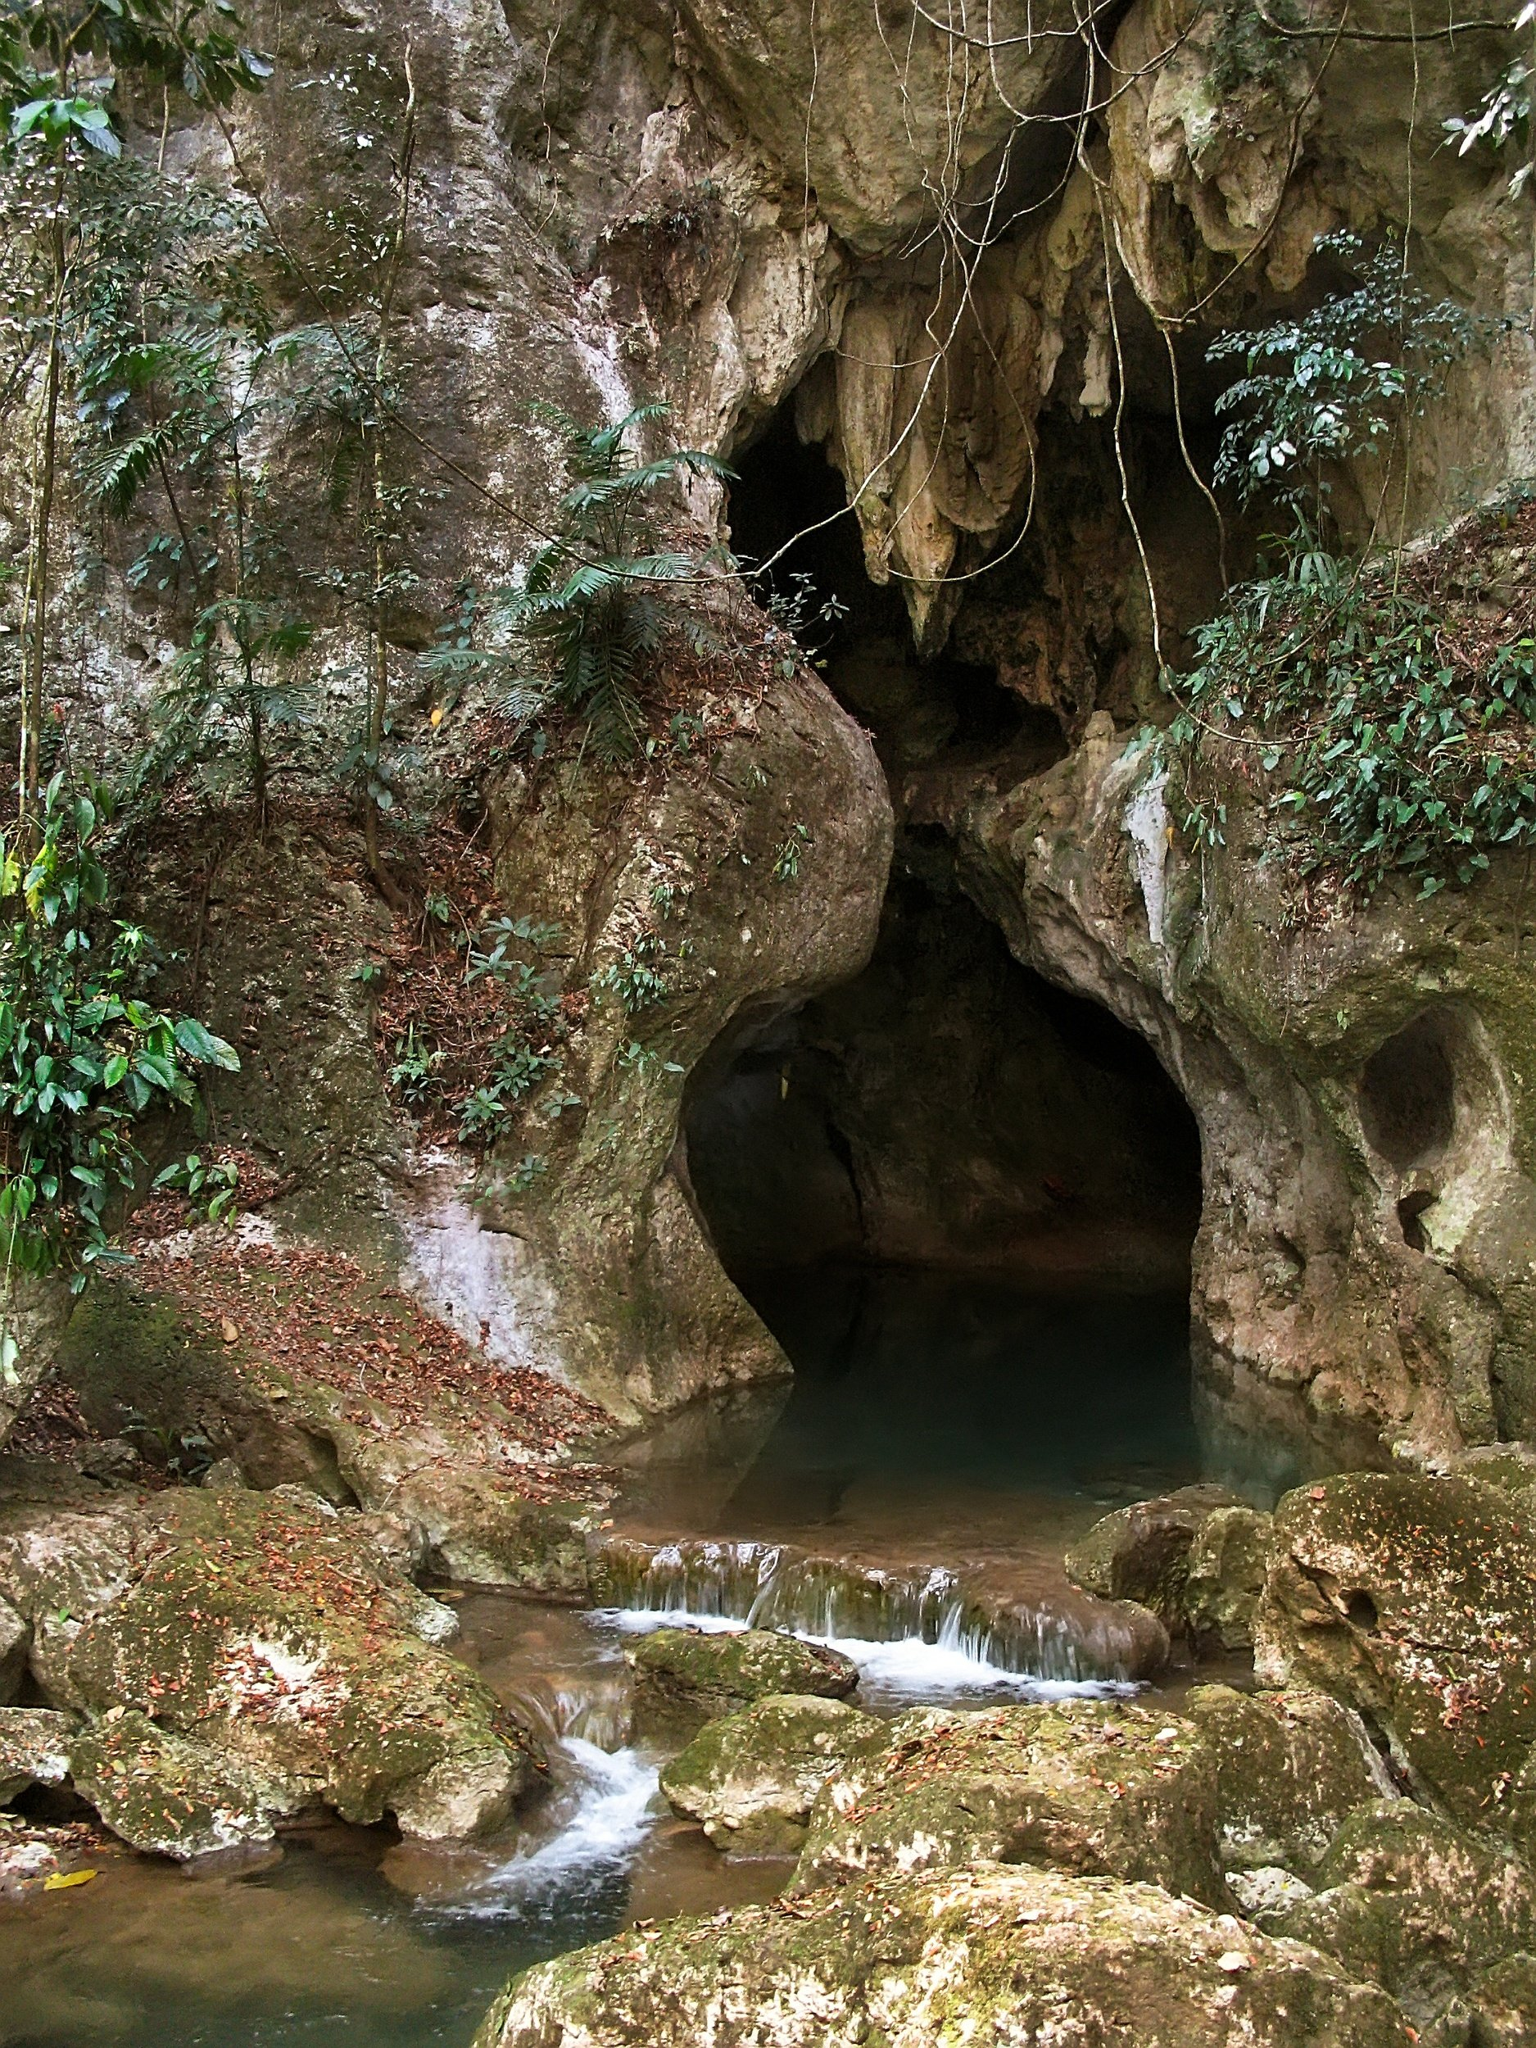 Explore the ATM Cave